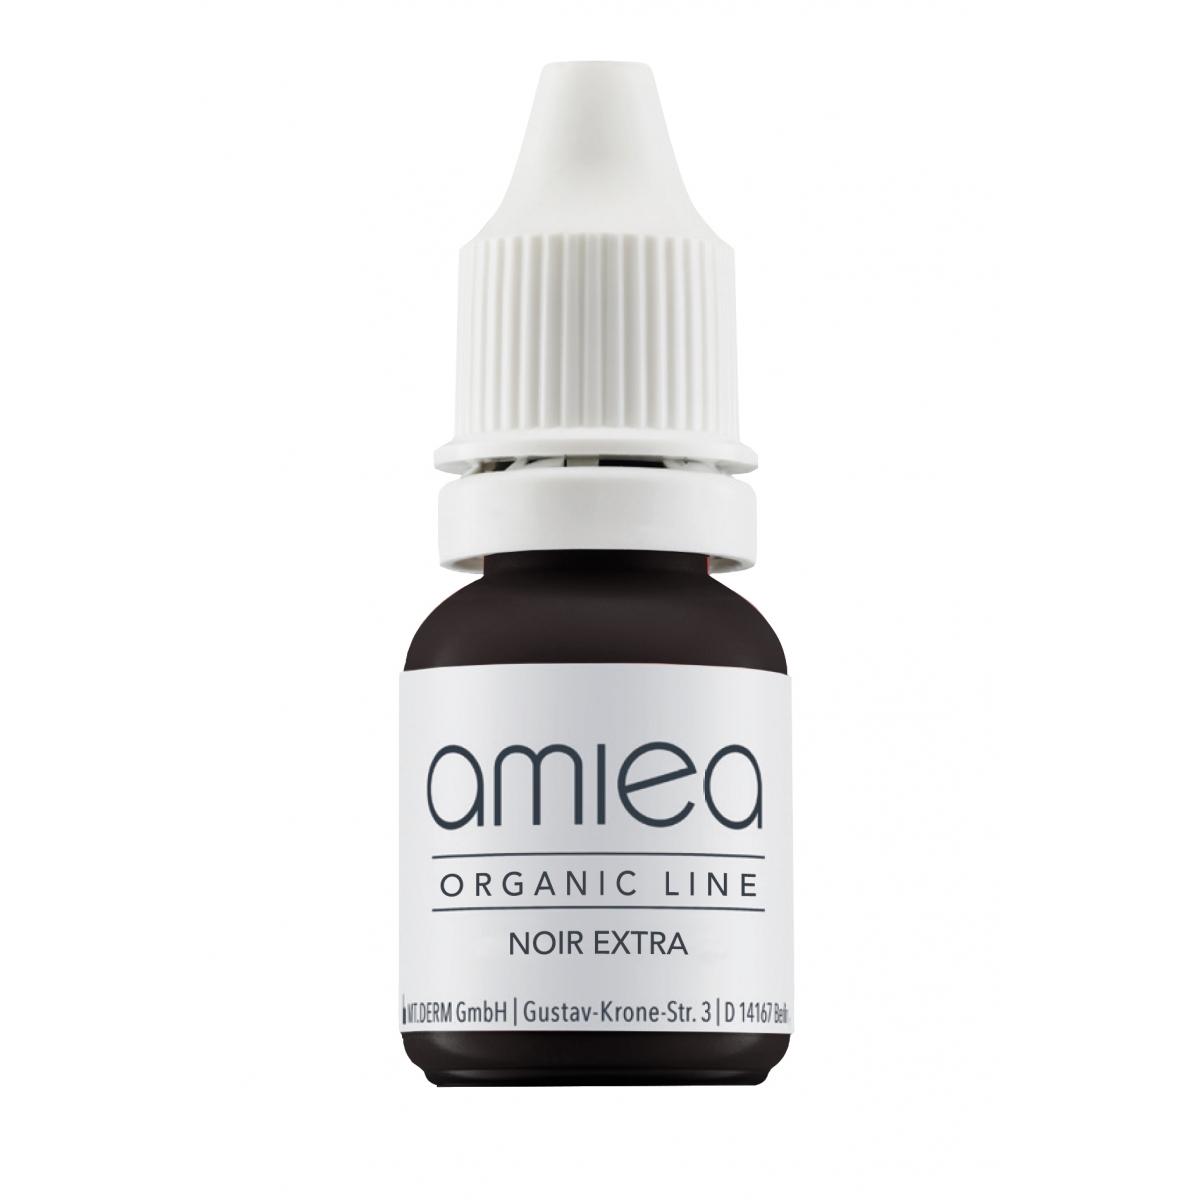 ORGANIC LINE (10ml) - PIGMENT NOIR EXTRA ORGANICLINE AMIEA (10 ml)